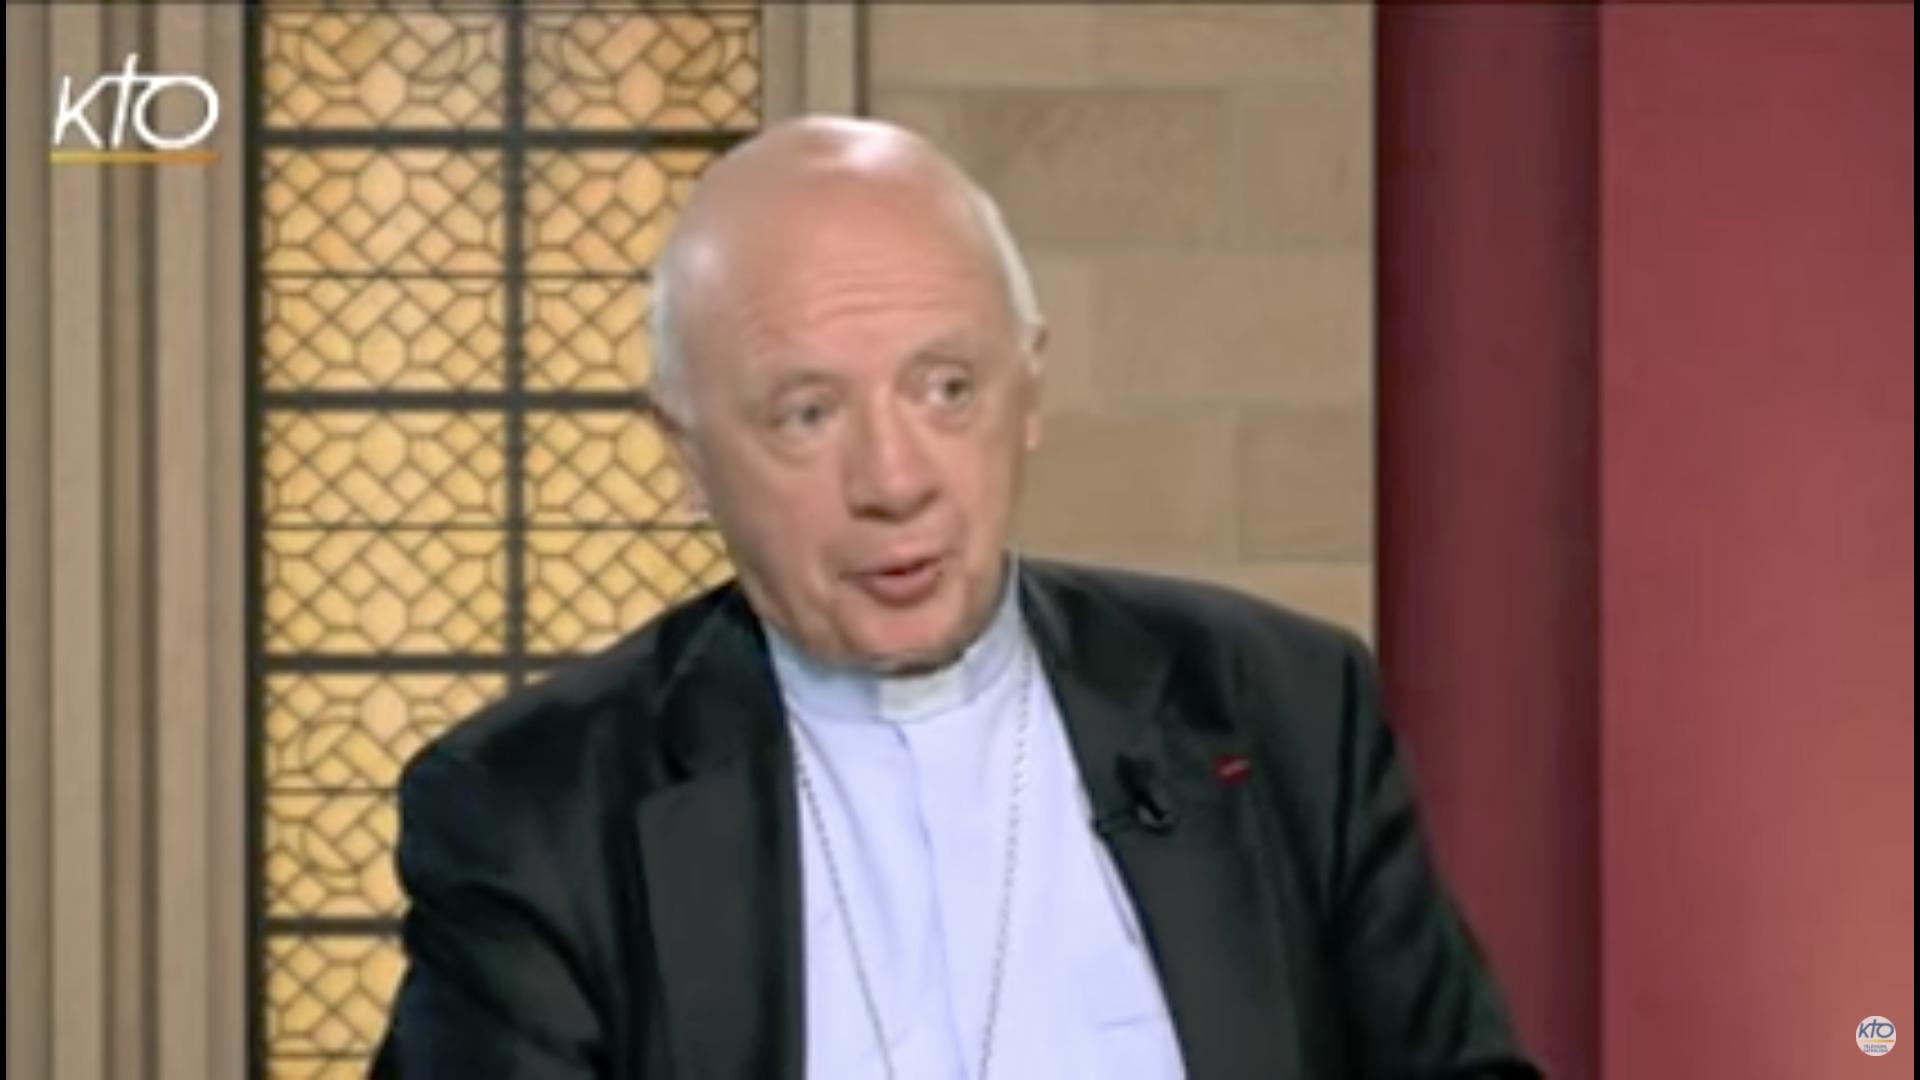 Mgr Jean-Claude Boulanger, capture @ Kto.Tv